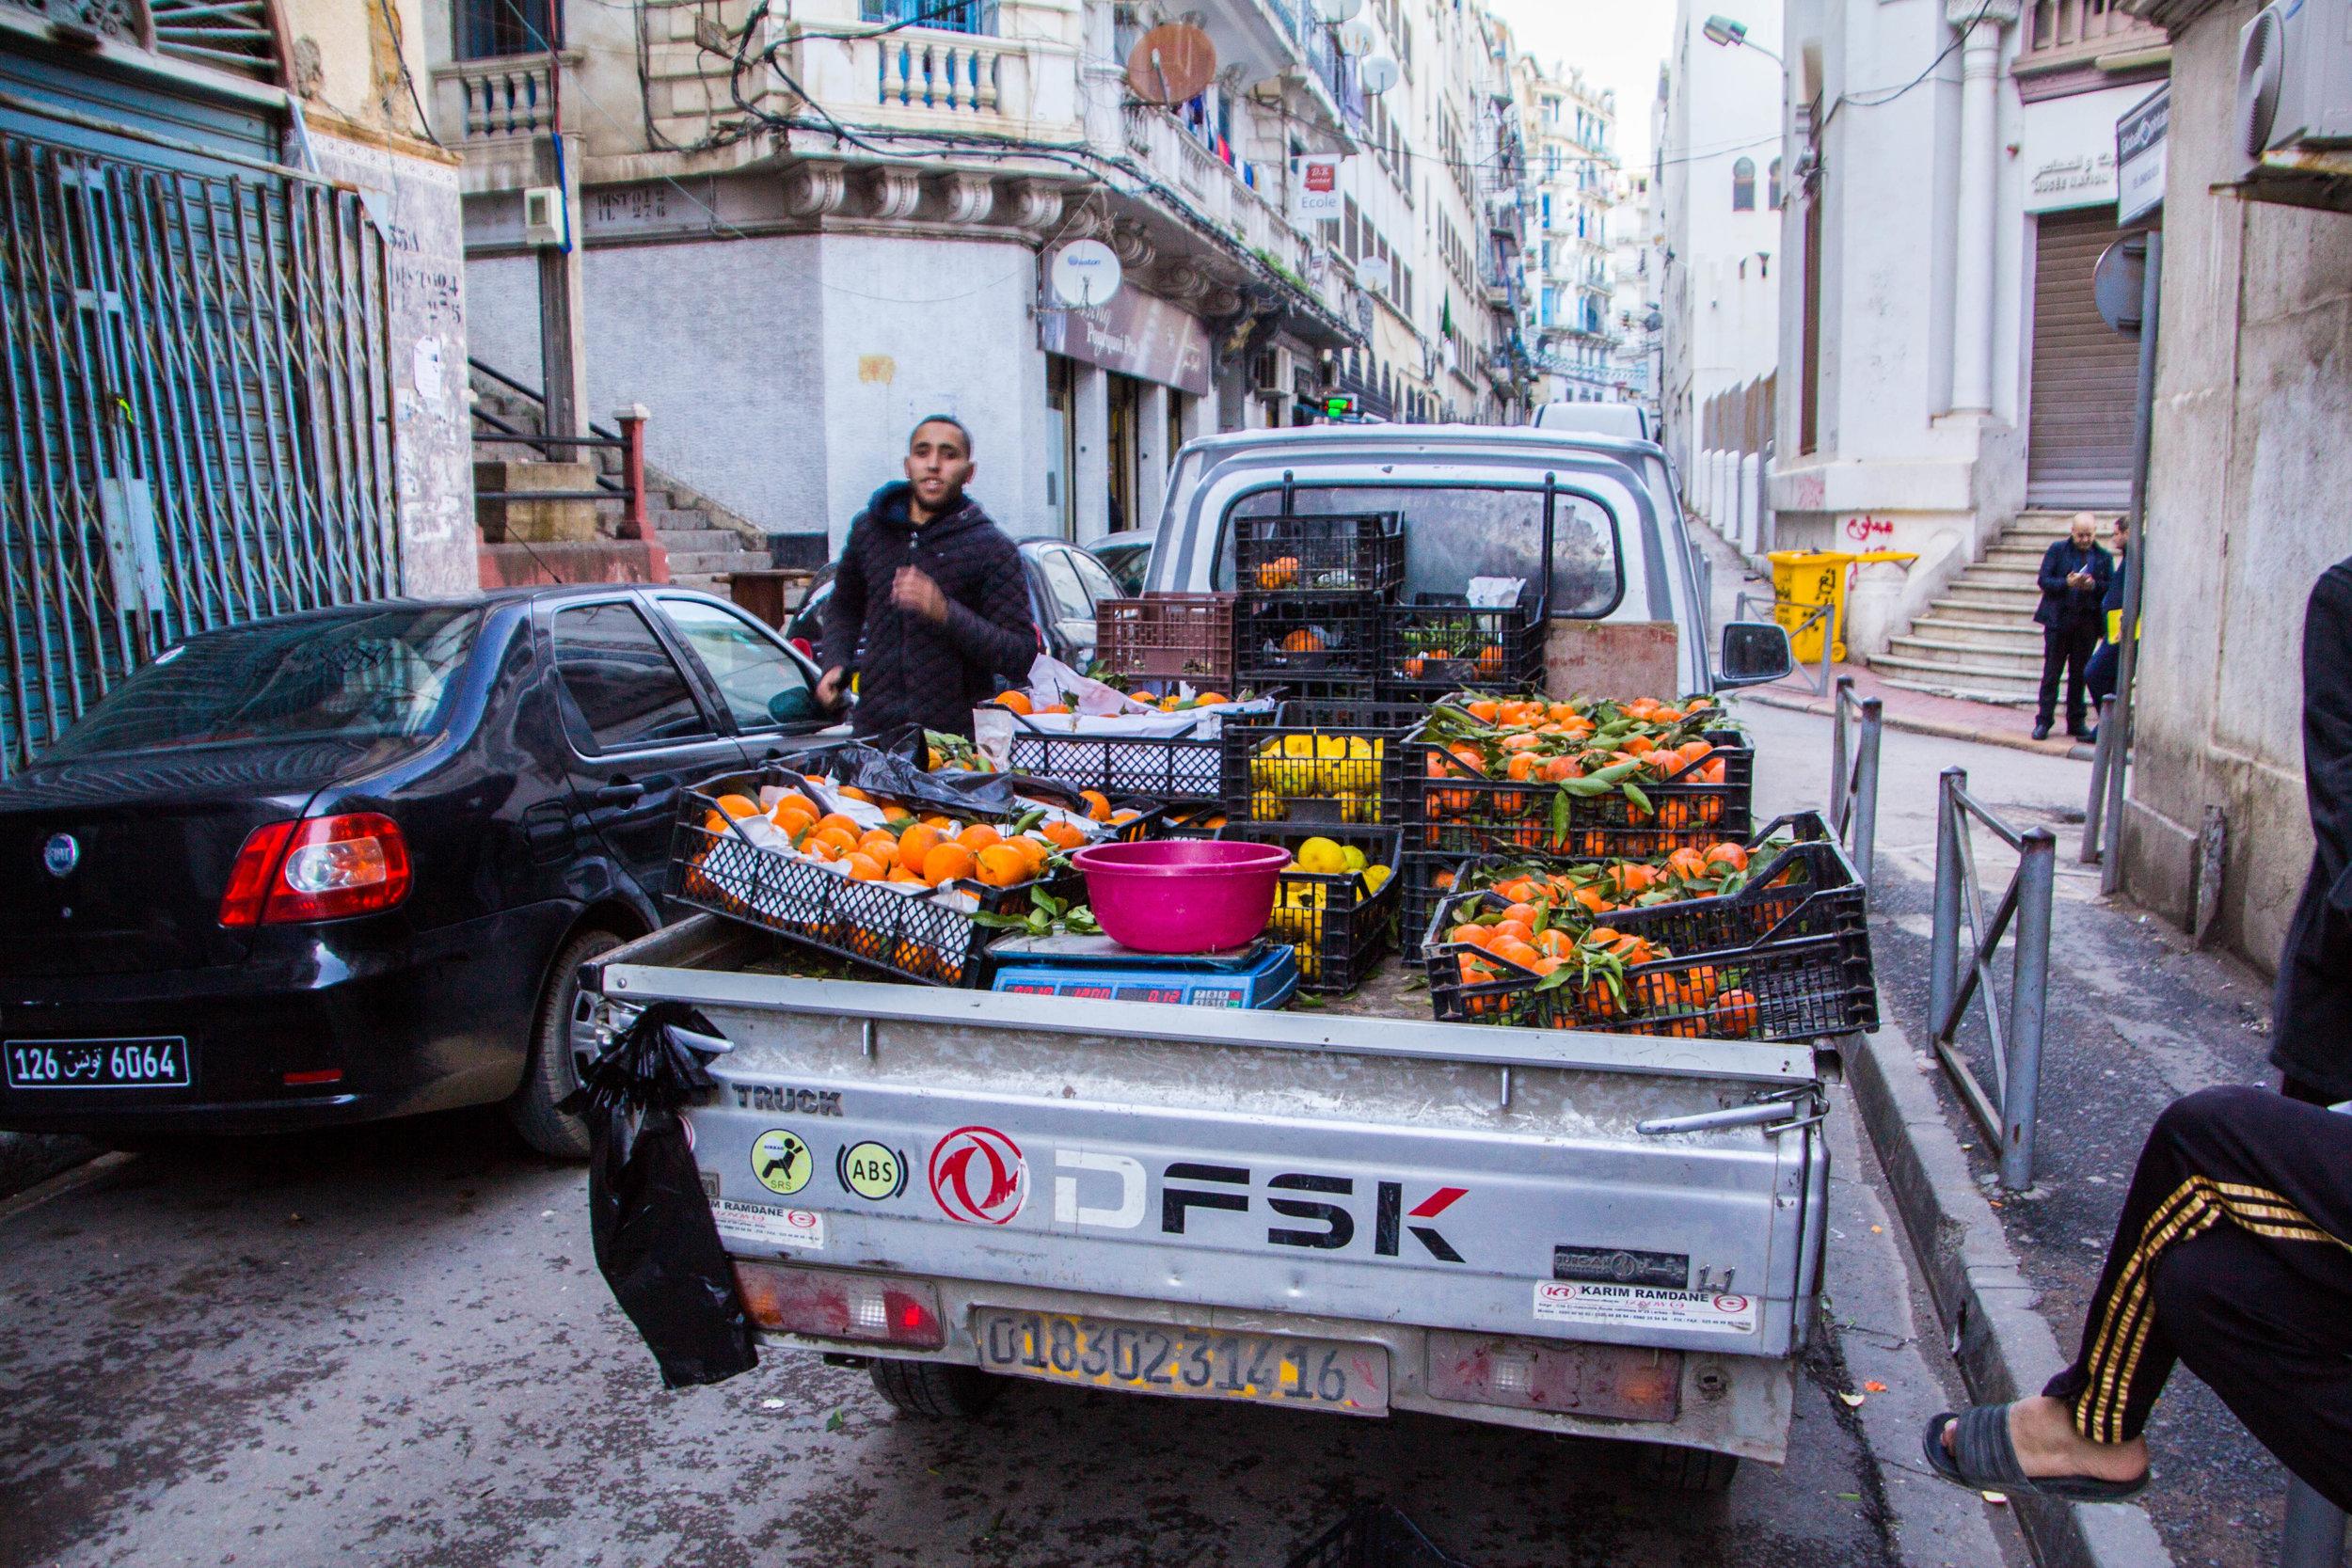 streets-algiers-algeria-22-2.jpg